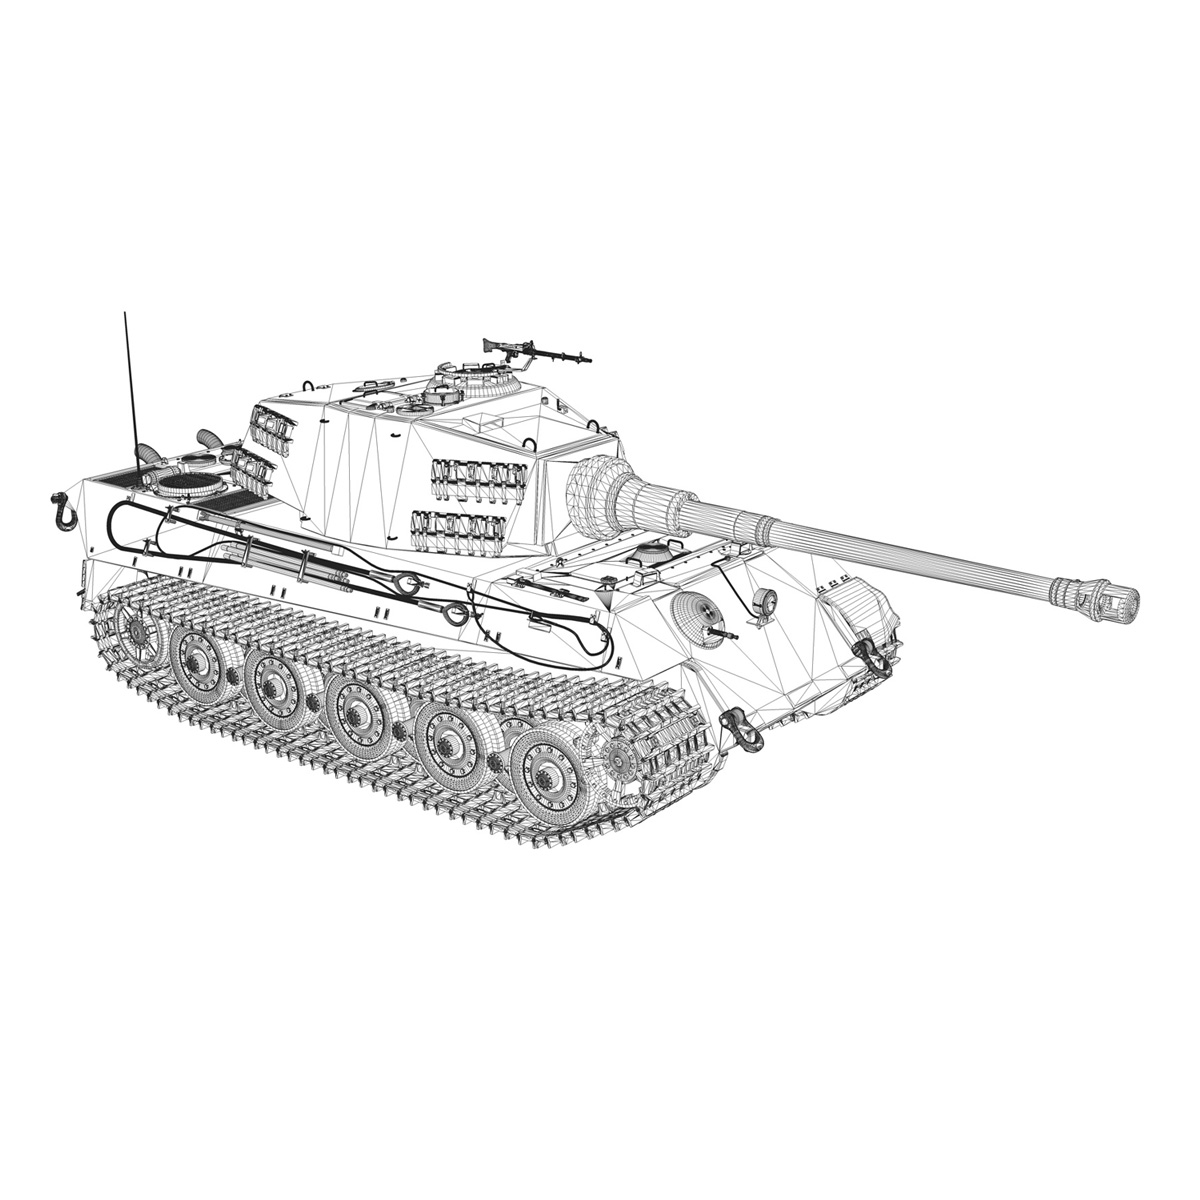 panzerkampfwagen vi – ausf b – tiger ii – 201 3d model 3ds c4d lwo lw lws obj 293313